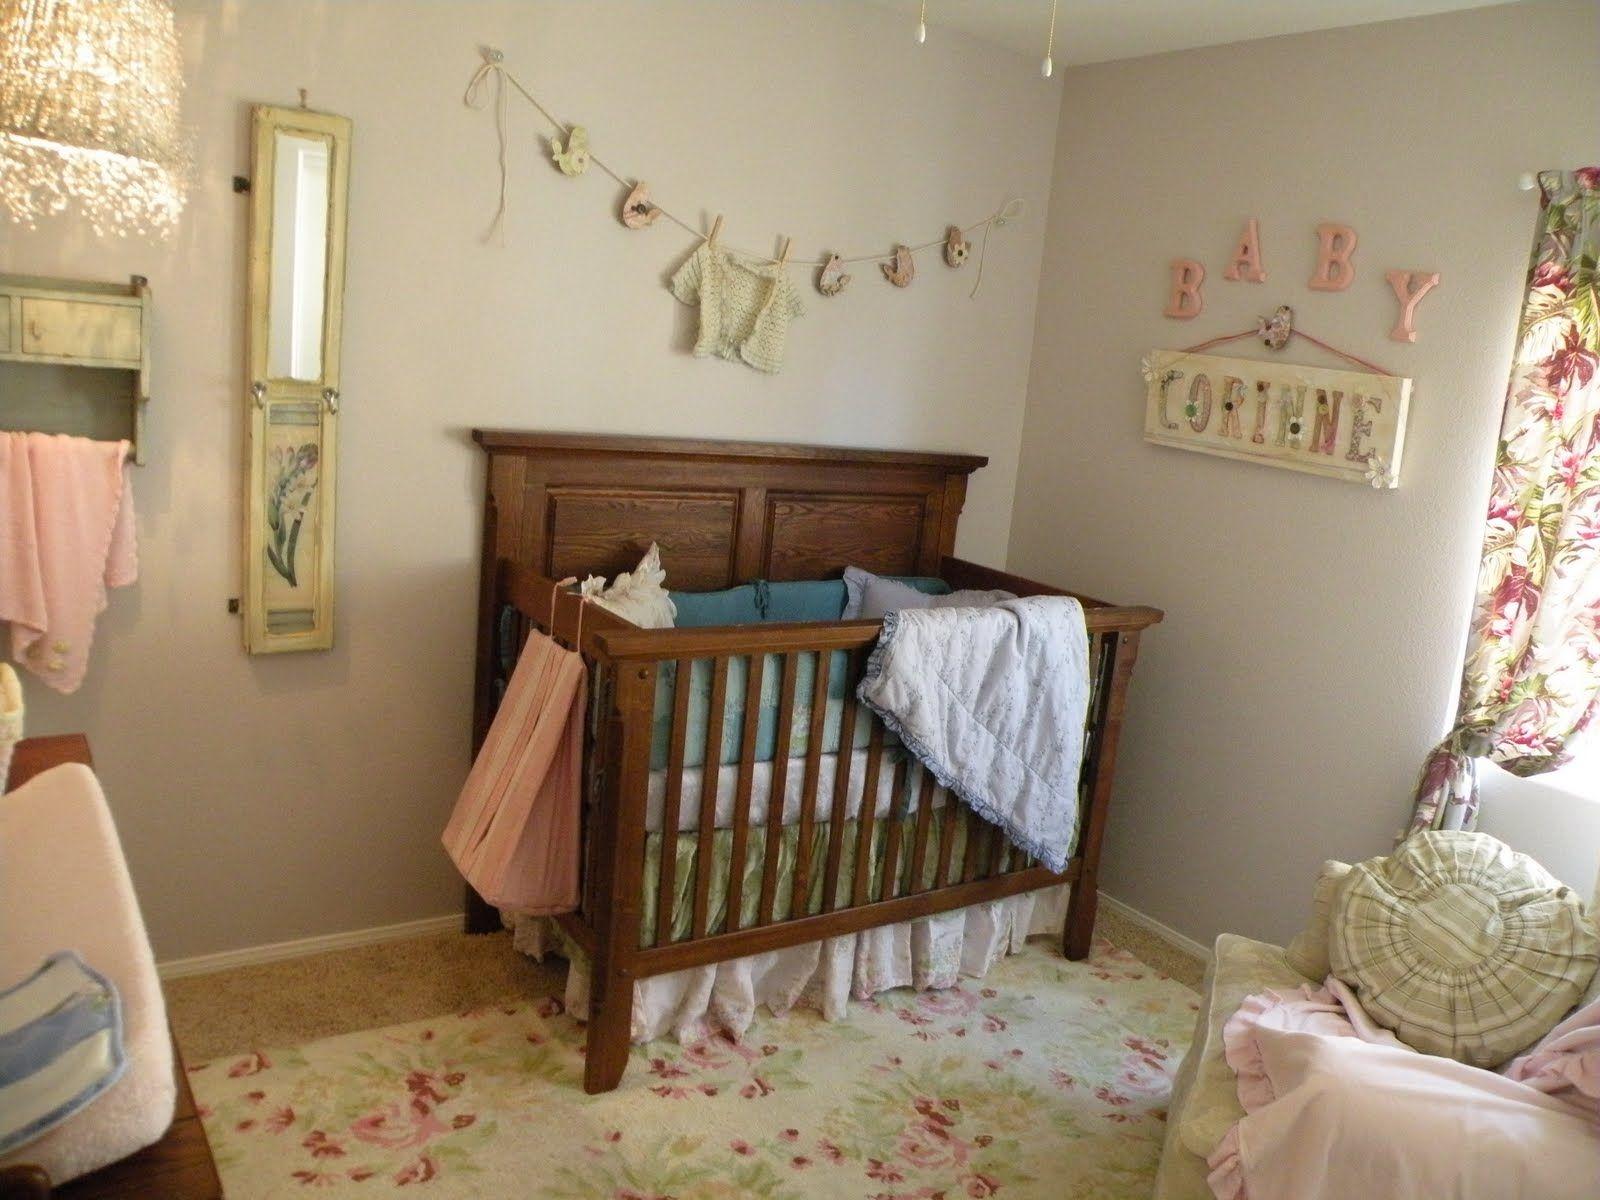 Vintage Eclectic Girl S Baby Nursery Design Dazzle Baby Nursery Room Design Baby Nursery Design Girl Room